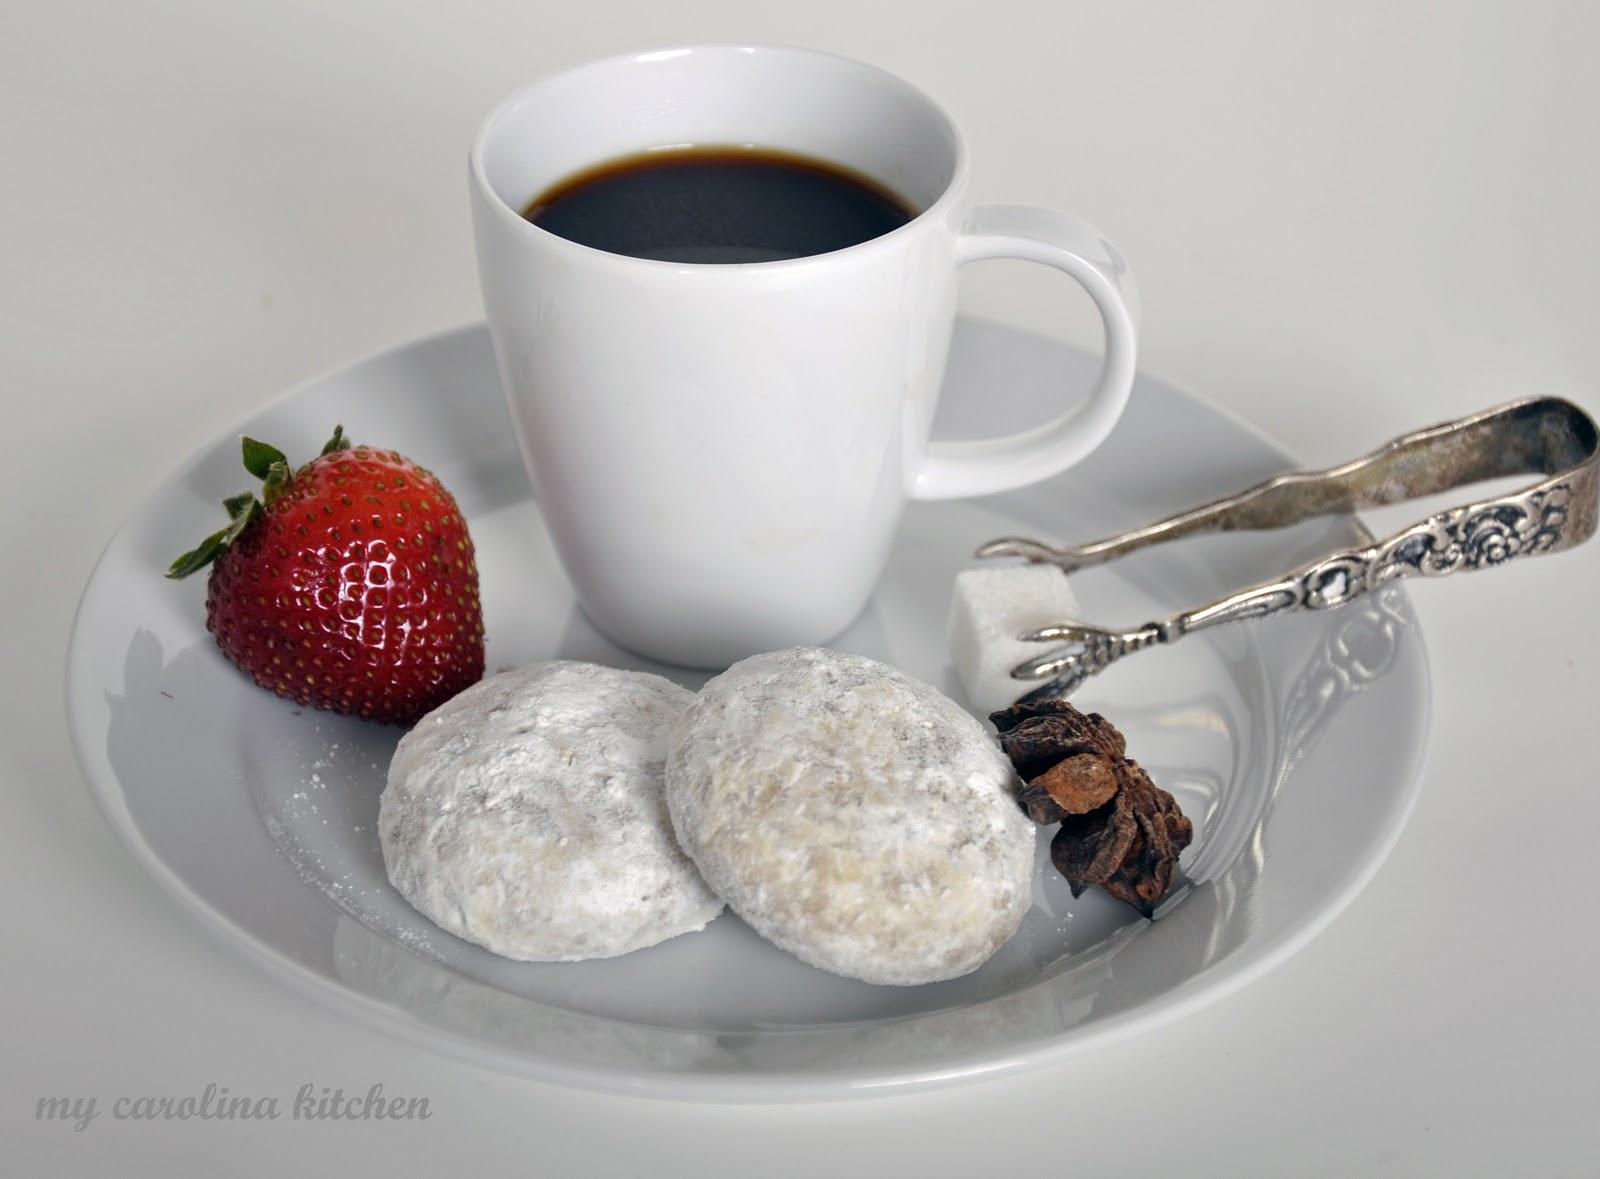 My Carolina Kitchen: Pfeffernusse cookies & Italian espresso with a ...